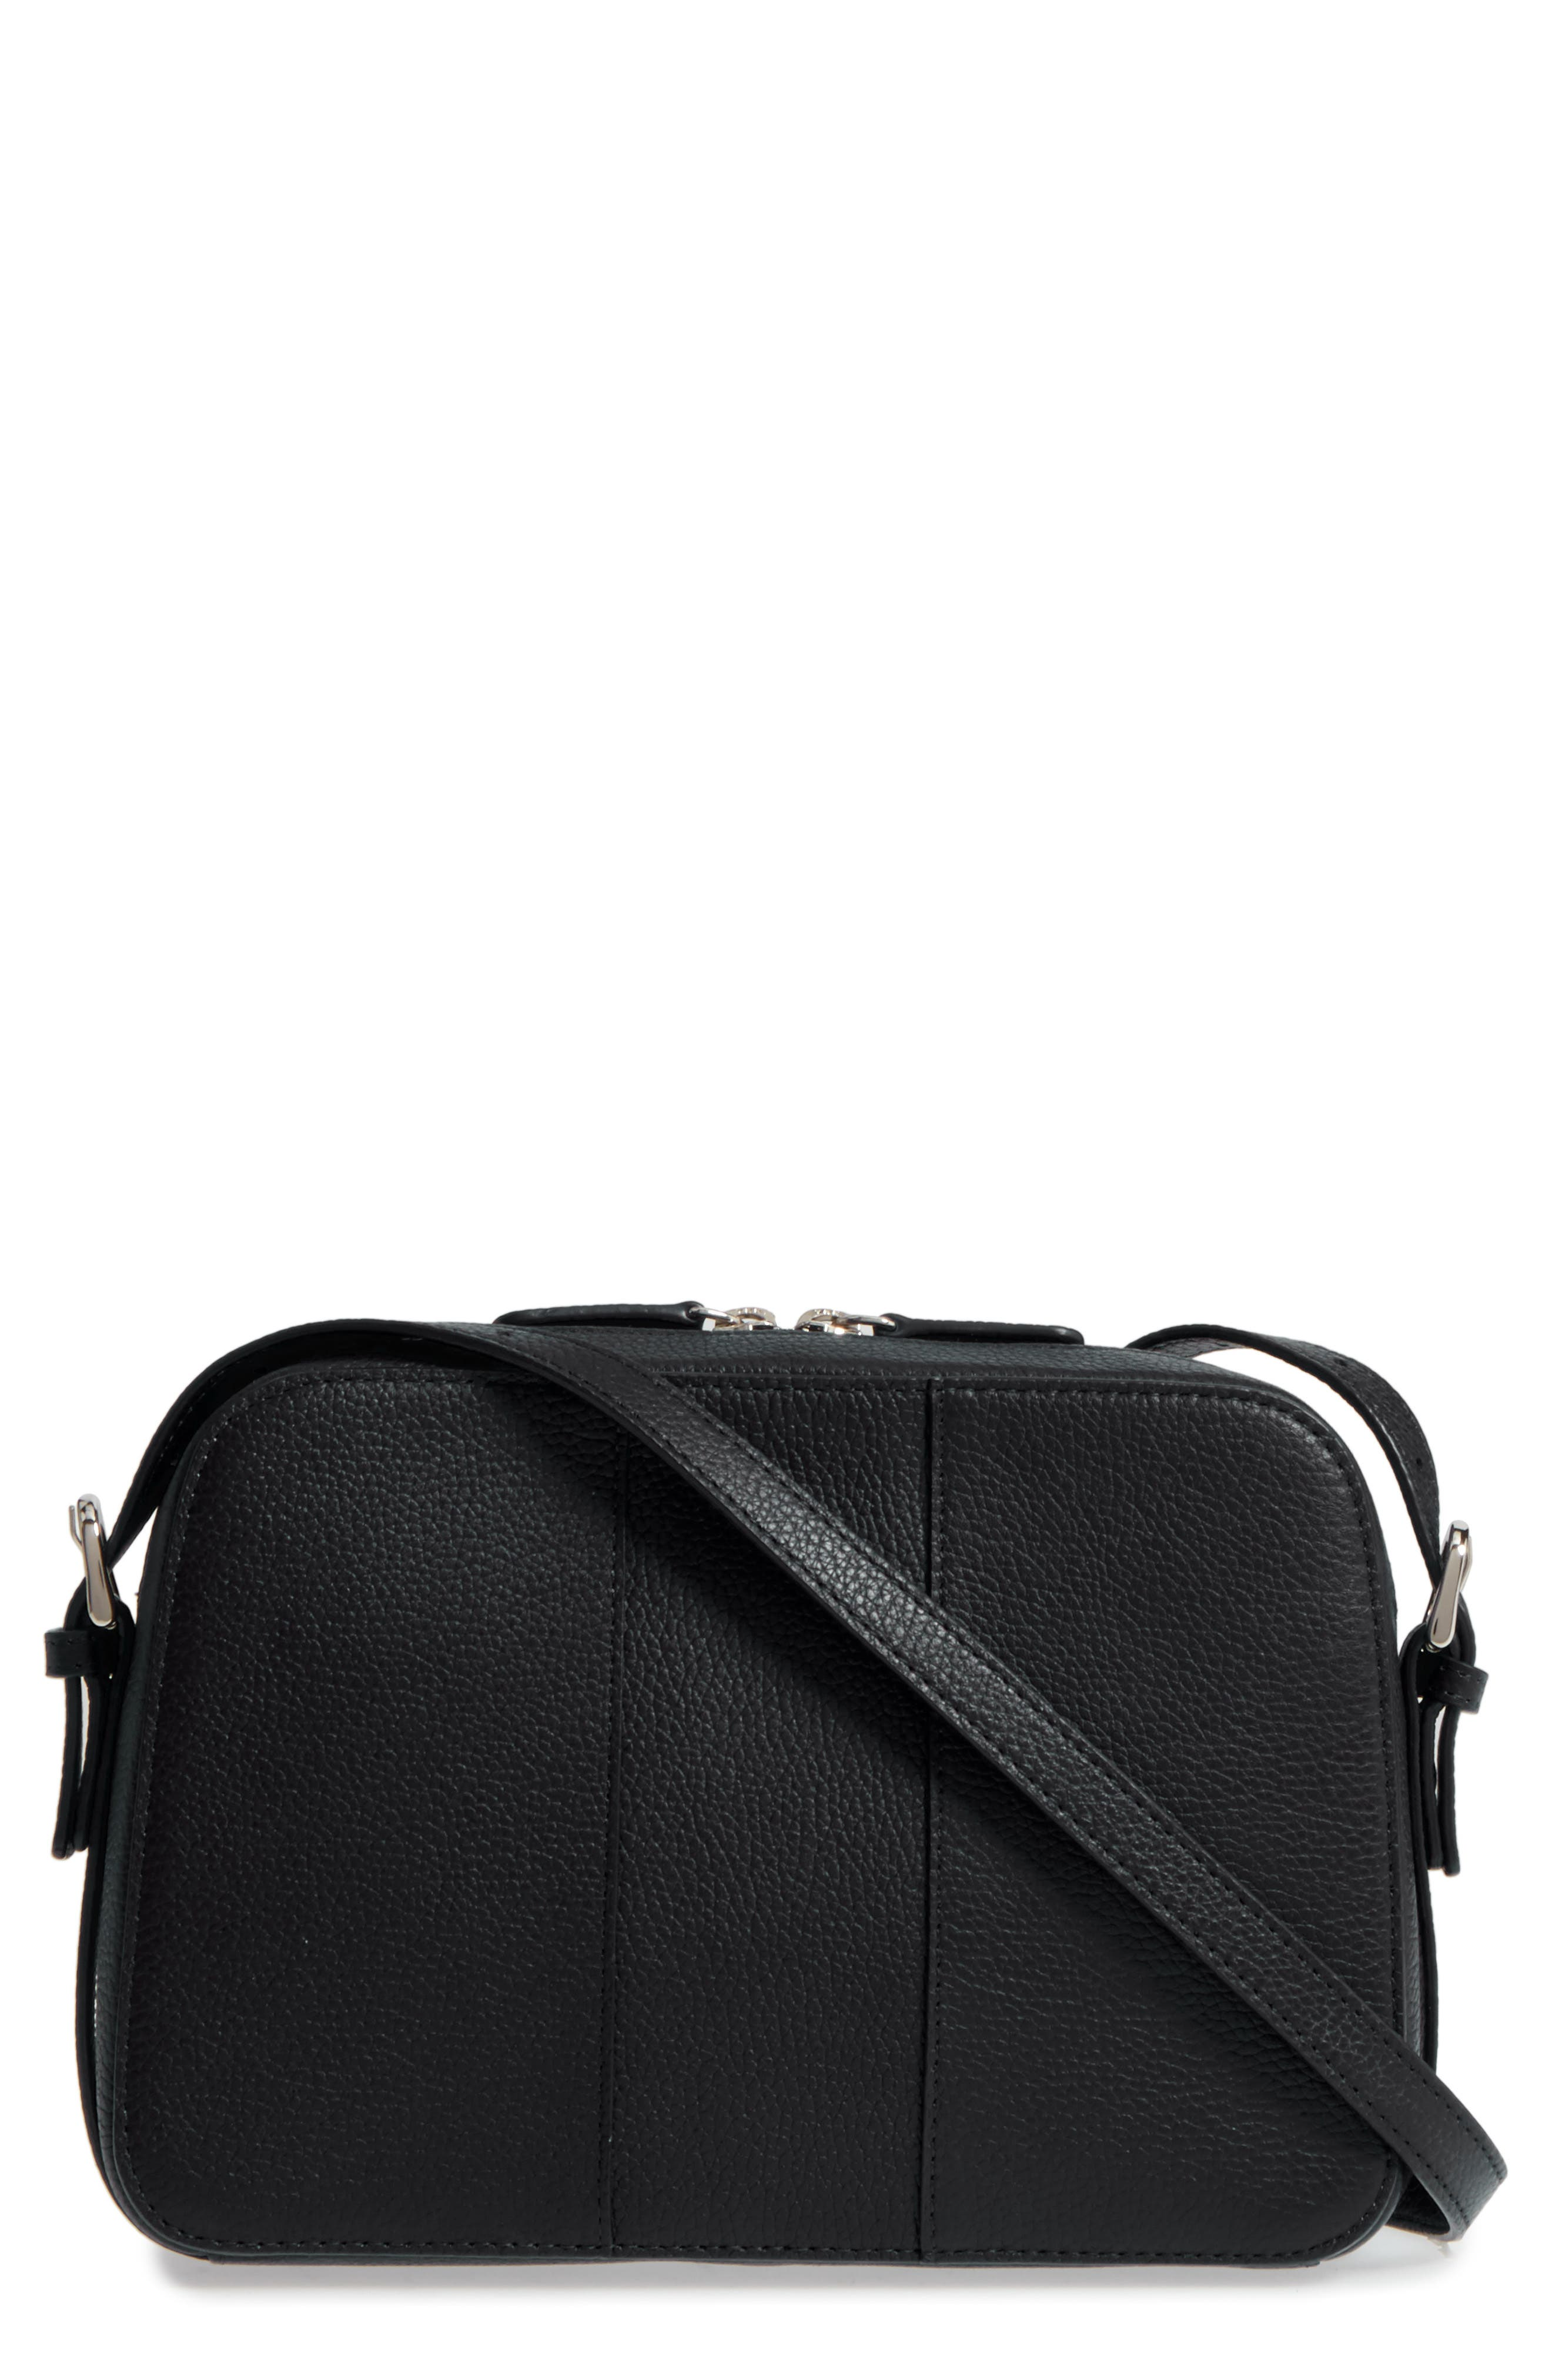 Brayden Leather Crossbody Camera Bag,                         Main,                         color, 001